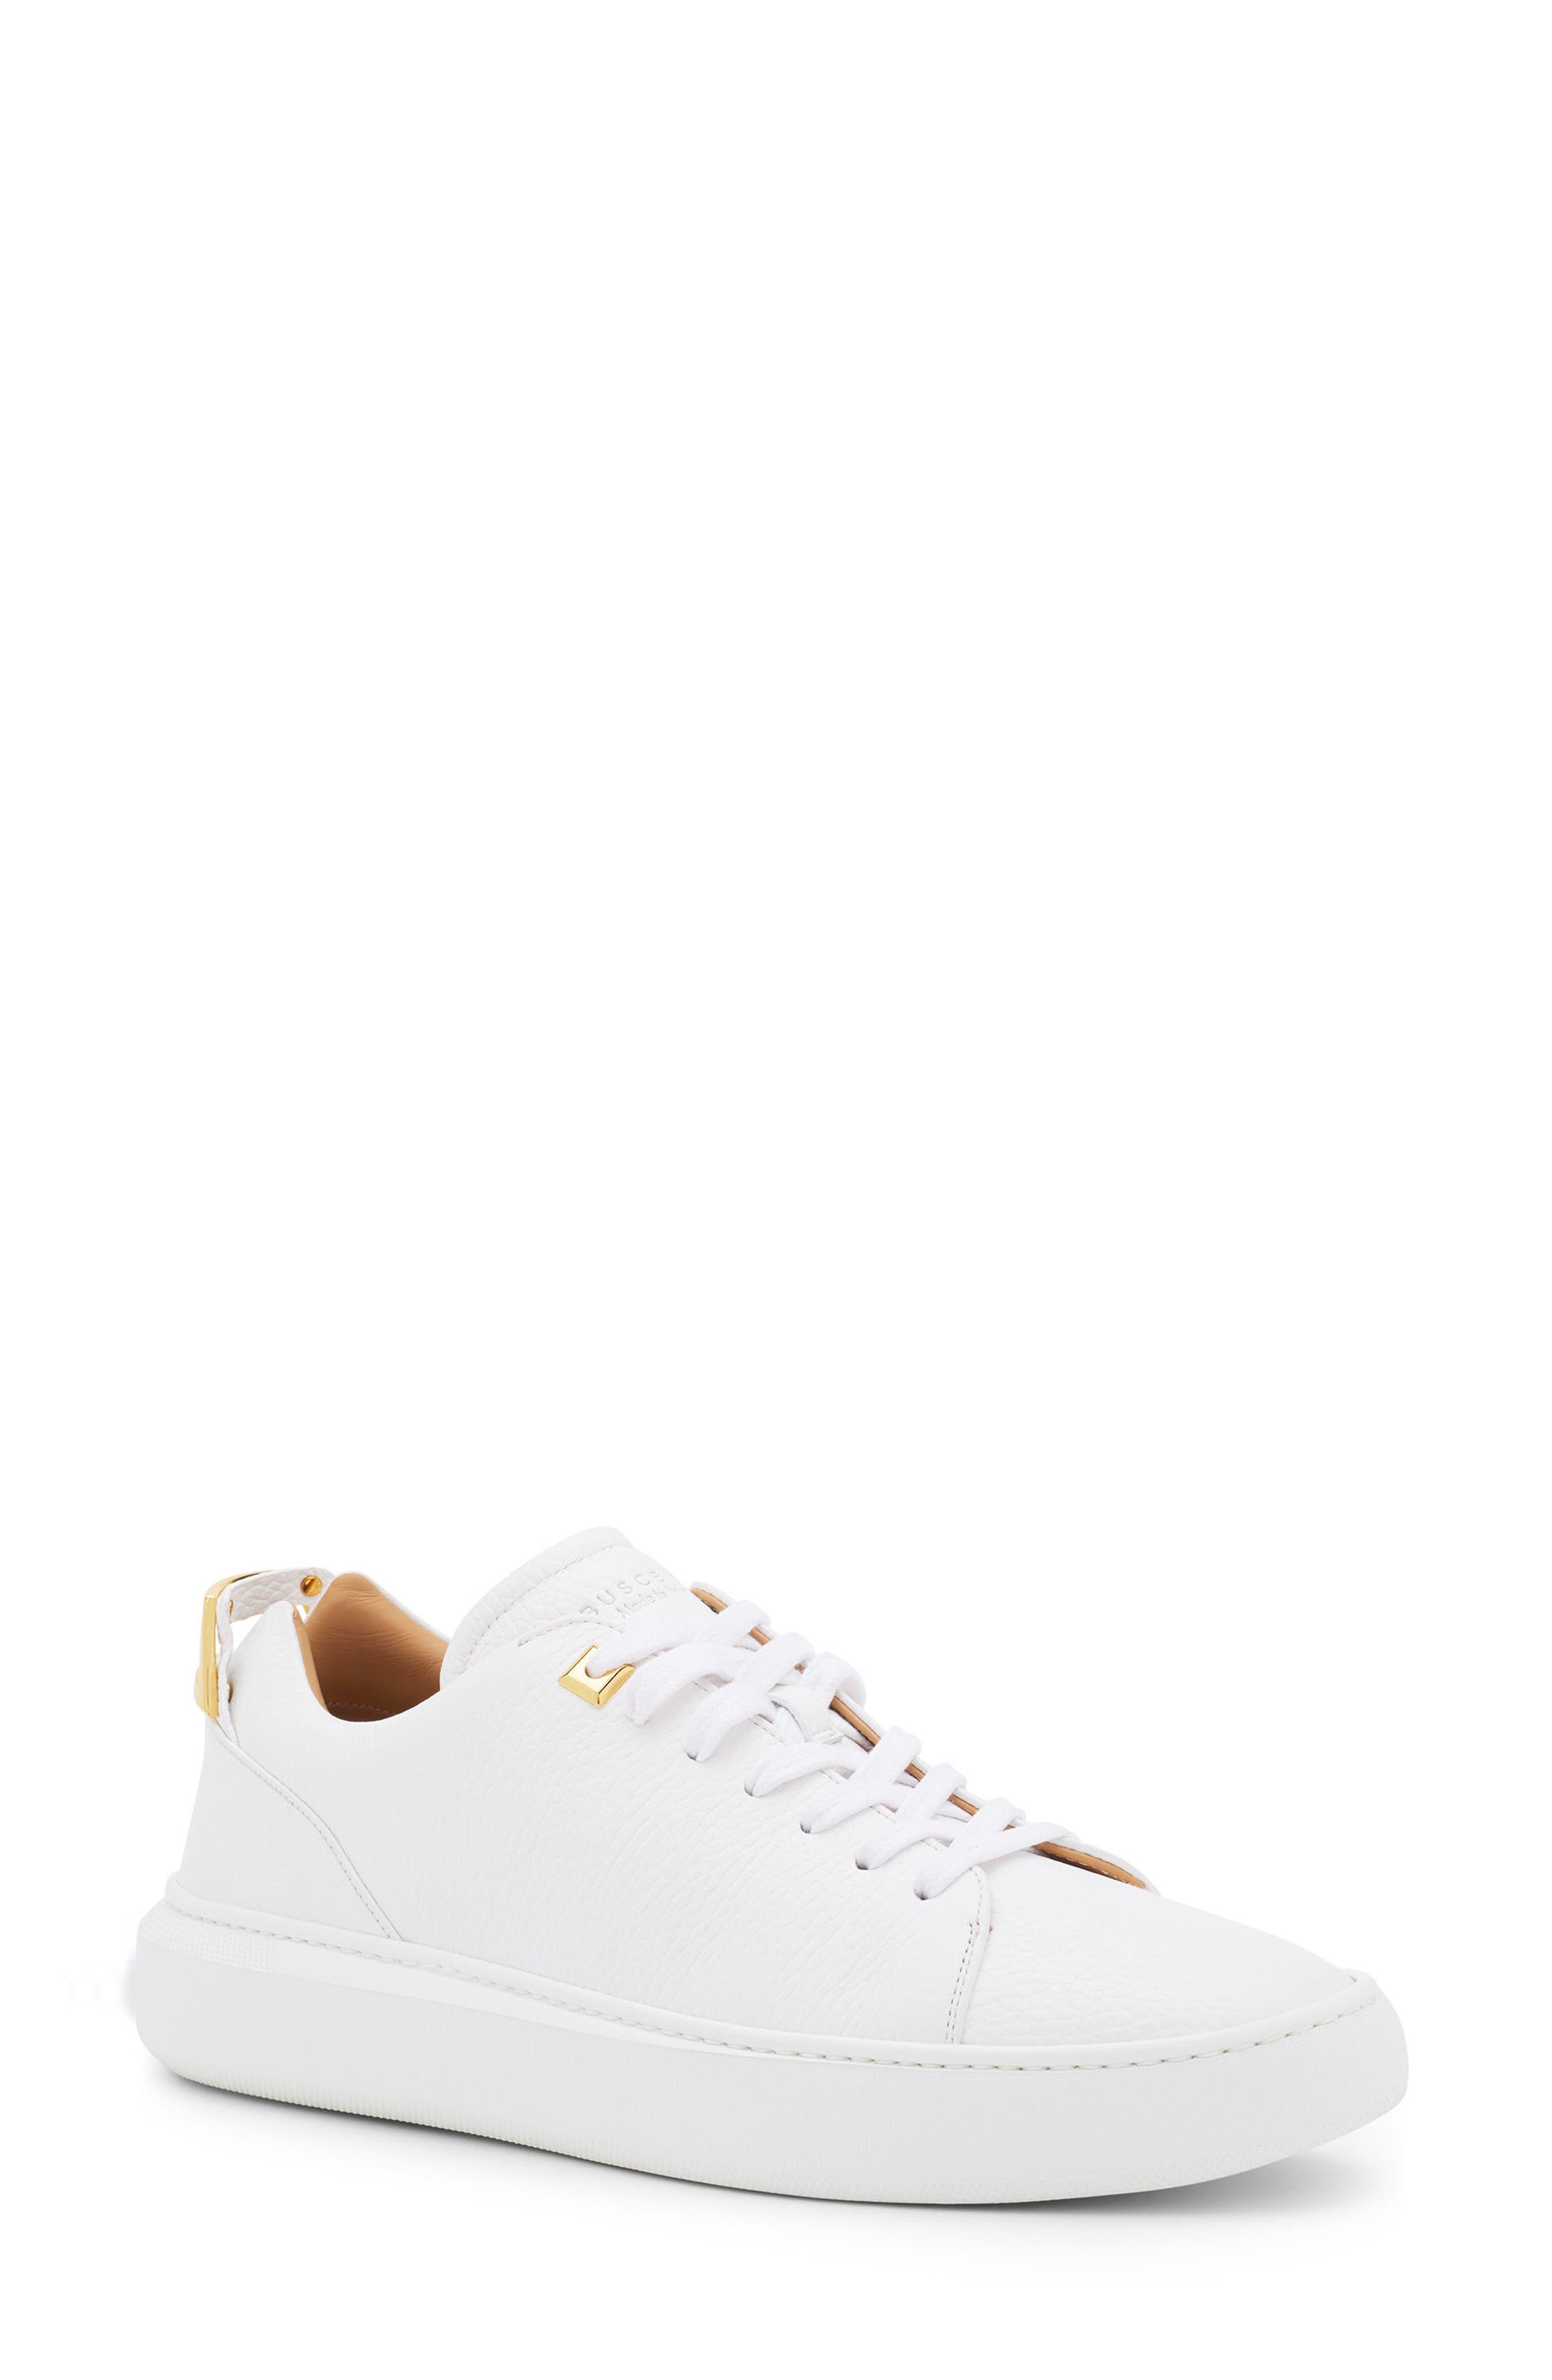 Uno Low Top Sneaker,                             Main thumbnail 1, color,                             100